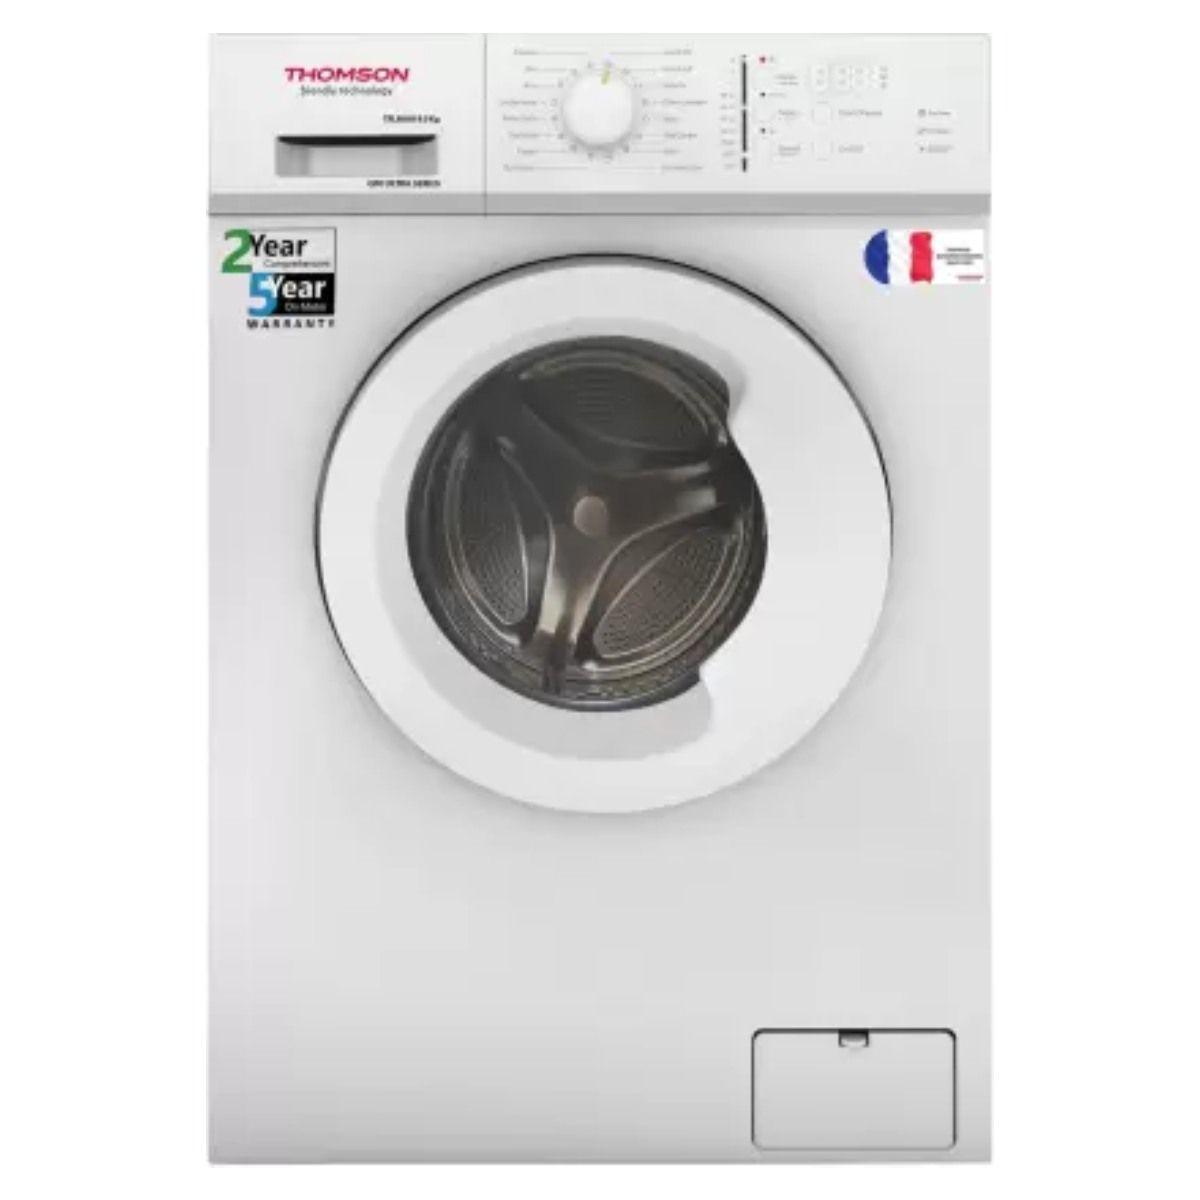 Thomson 8.5 kg Fully Automatic Front Load Washing Machine (TFL8500)